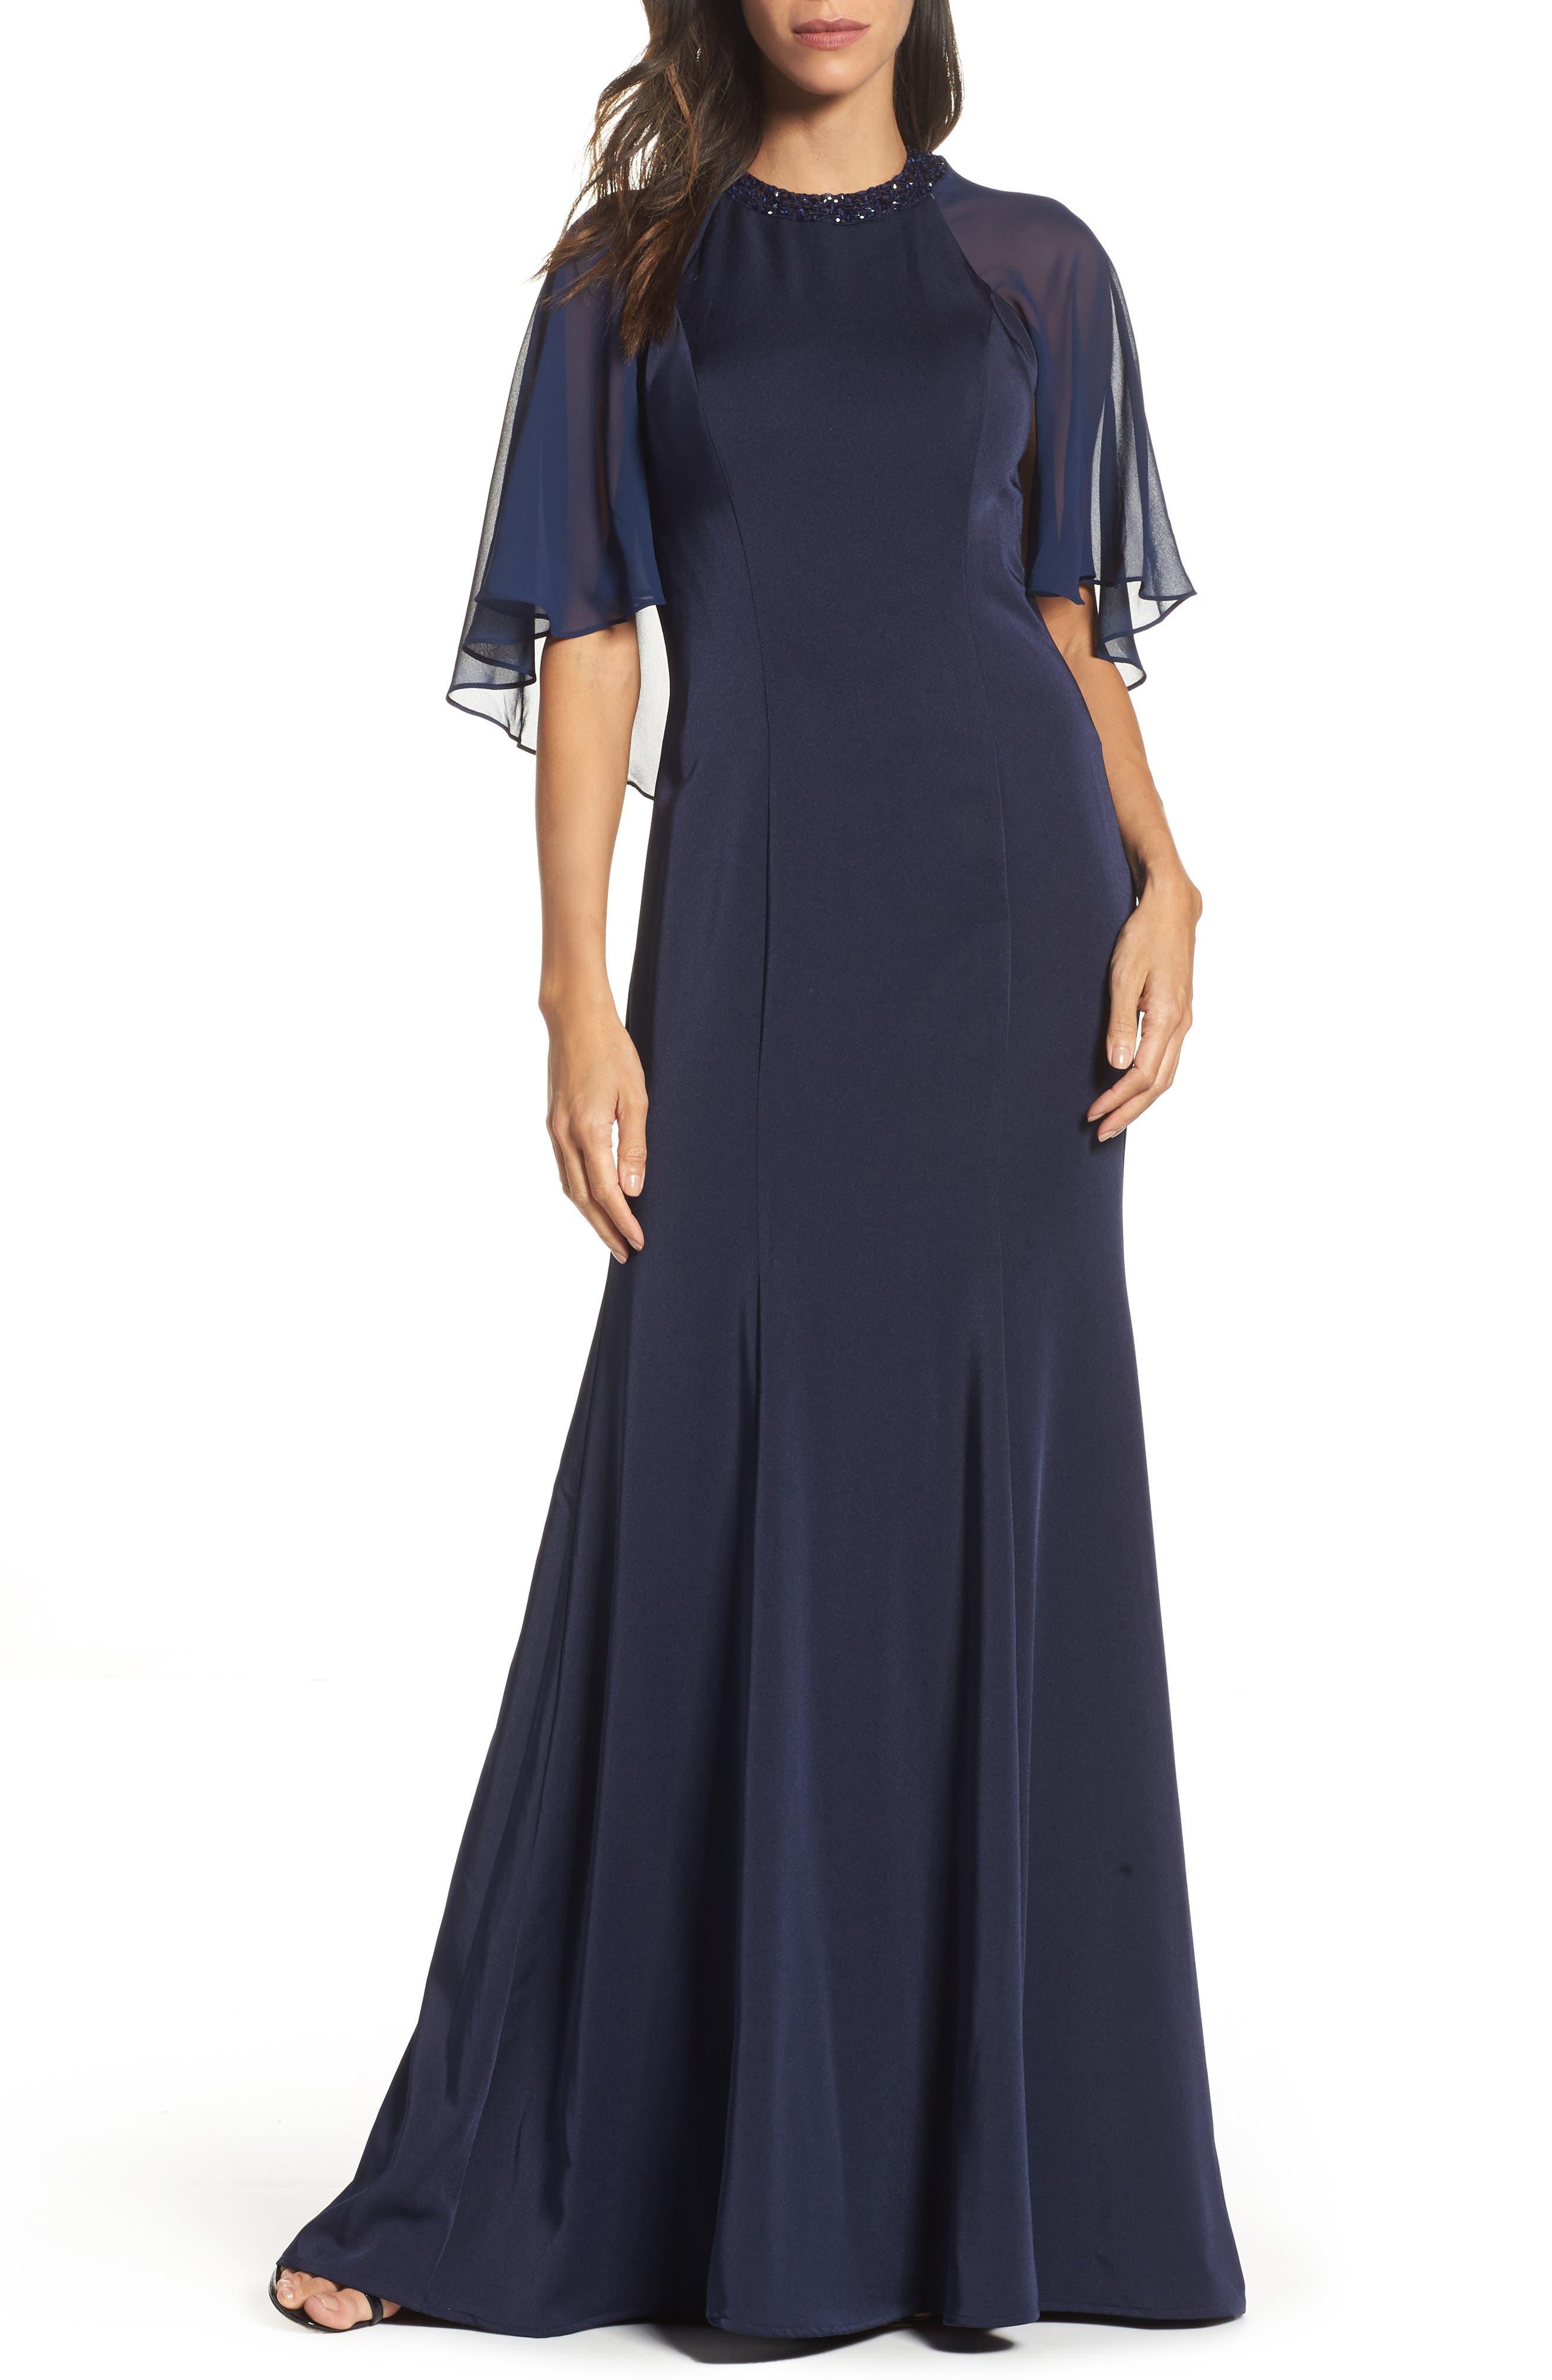 Cape Illusion Gown,                             Main thumbnail 1, color,                             NAVY